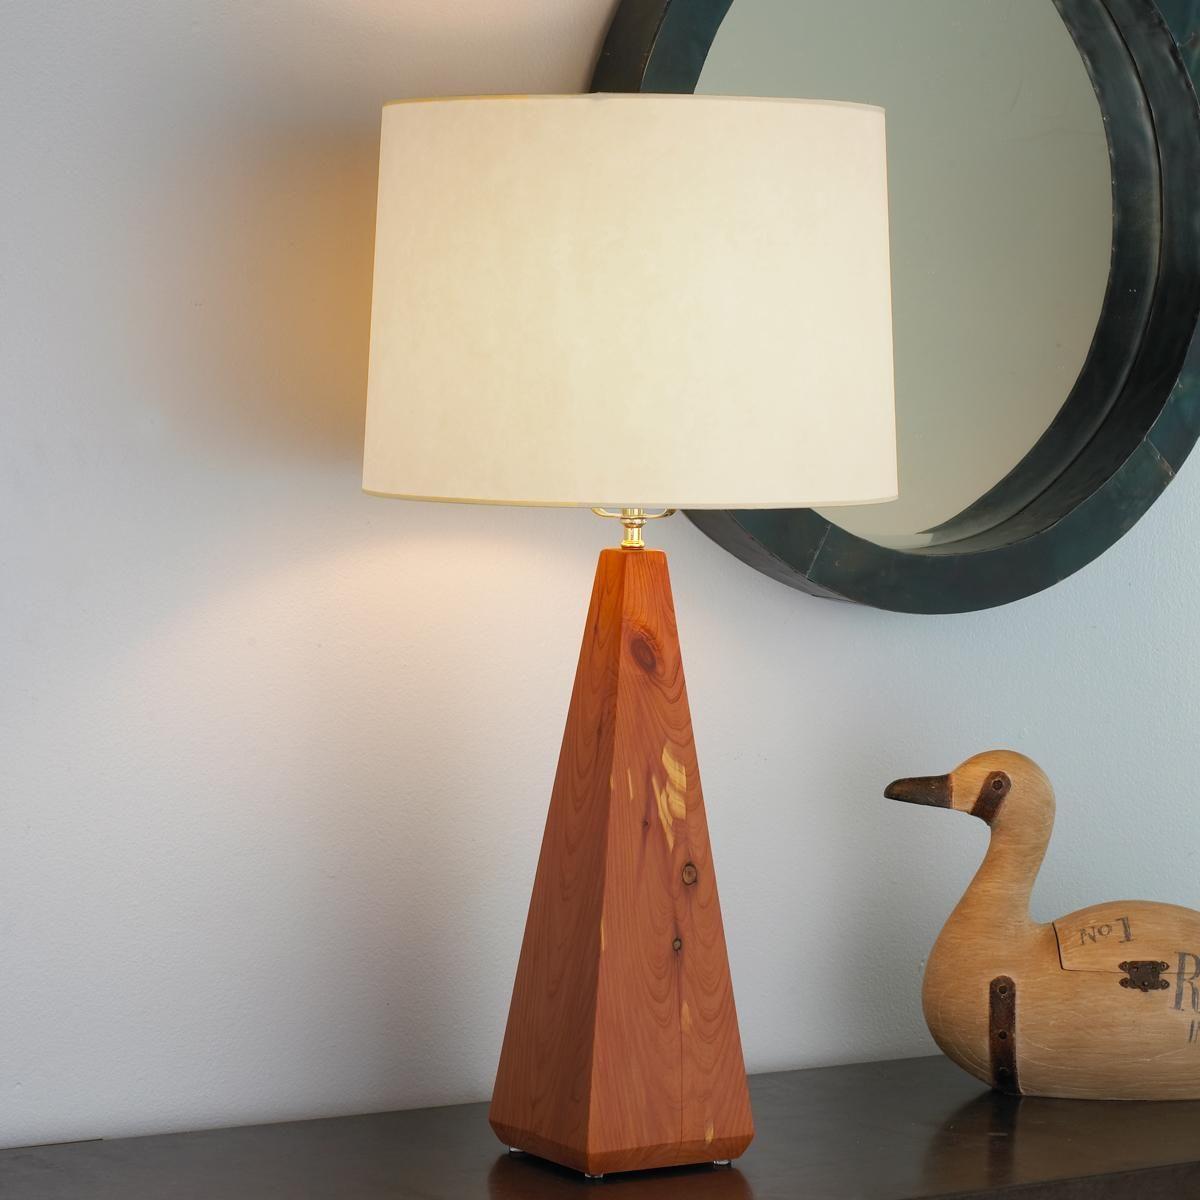 Artisan Wood Square Pyramid Lamp Base 3 Finishes Home Decor Lamp Lamp Bases